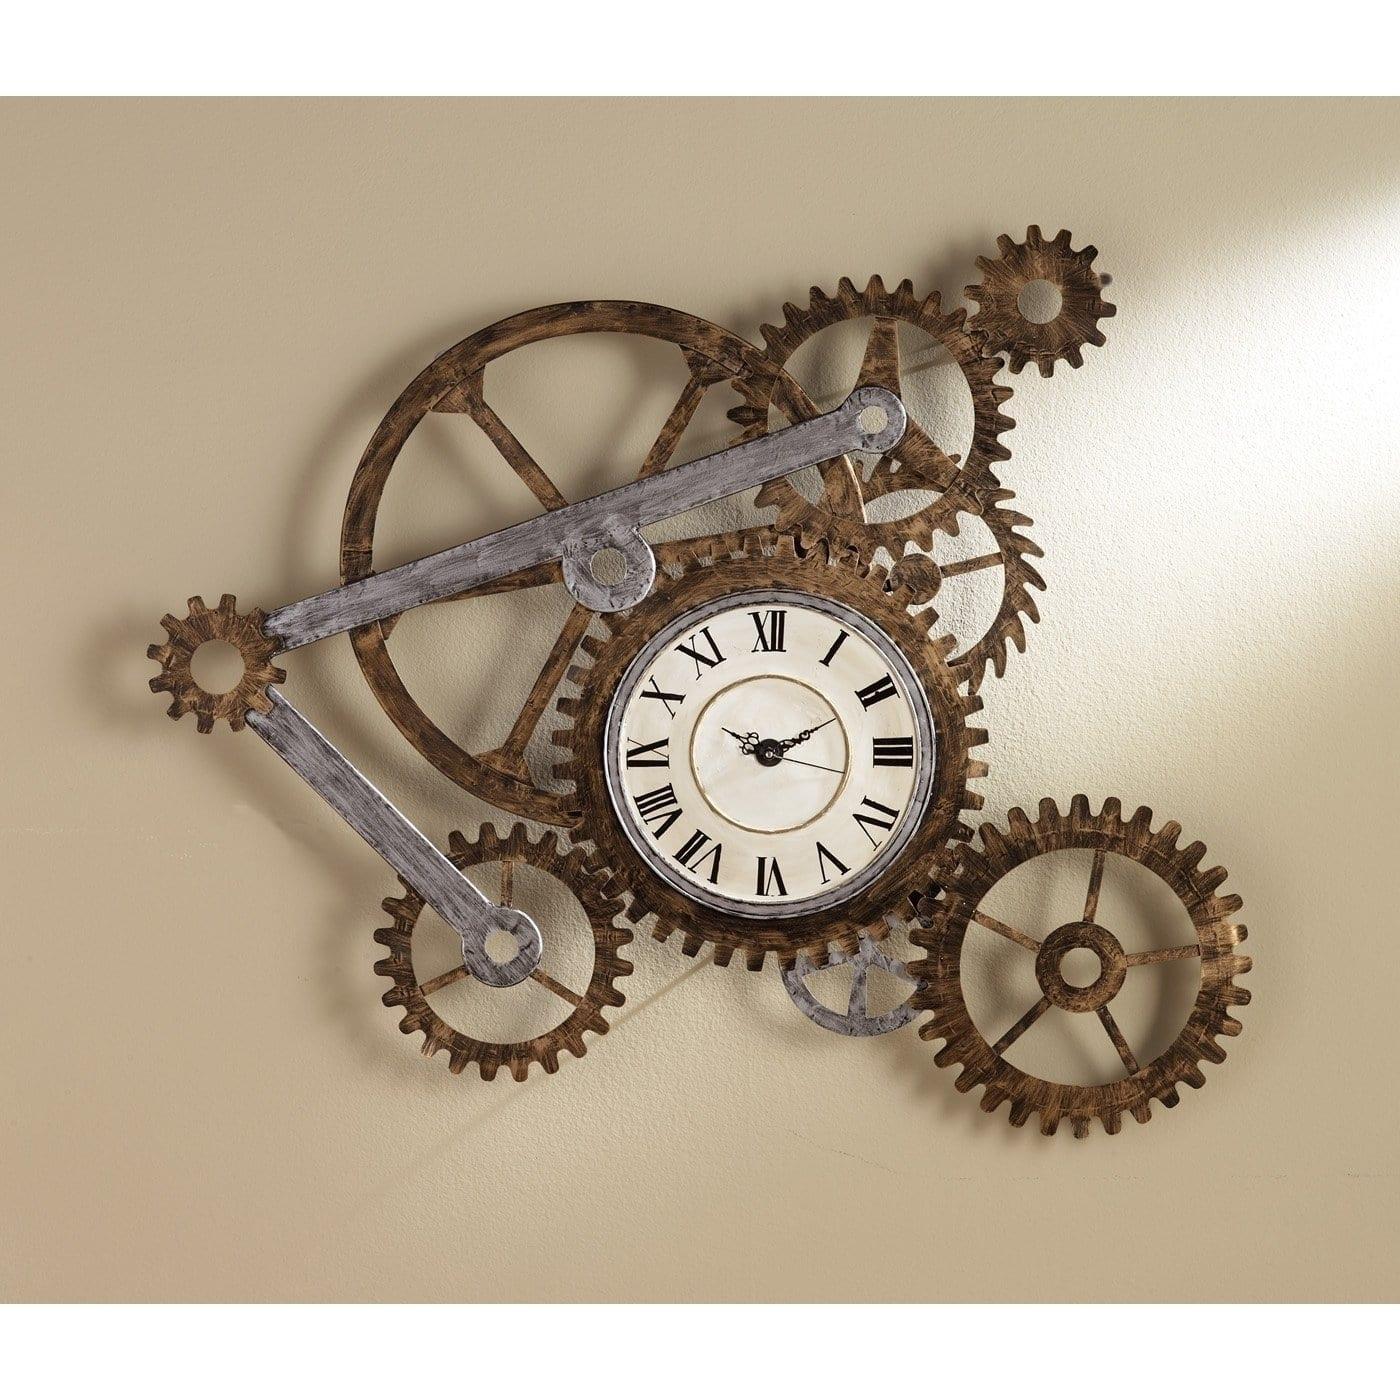 Relógio de engrenagens - Relógio Steampunk - Blog Farofeiros